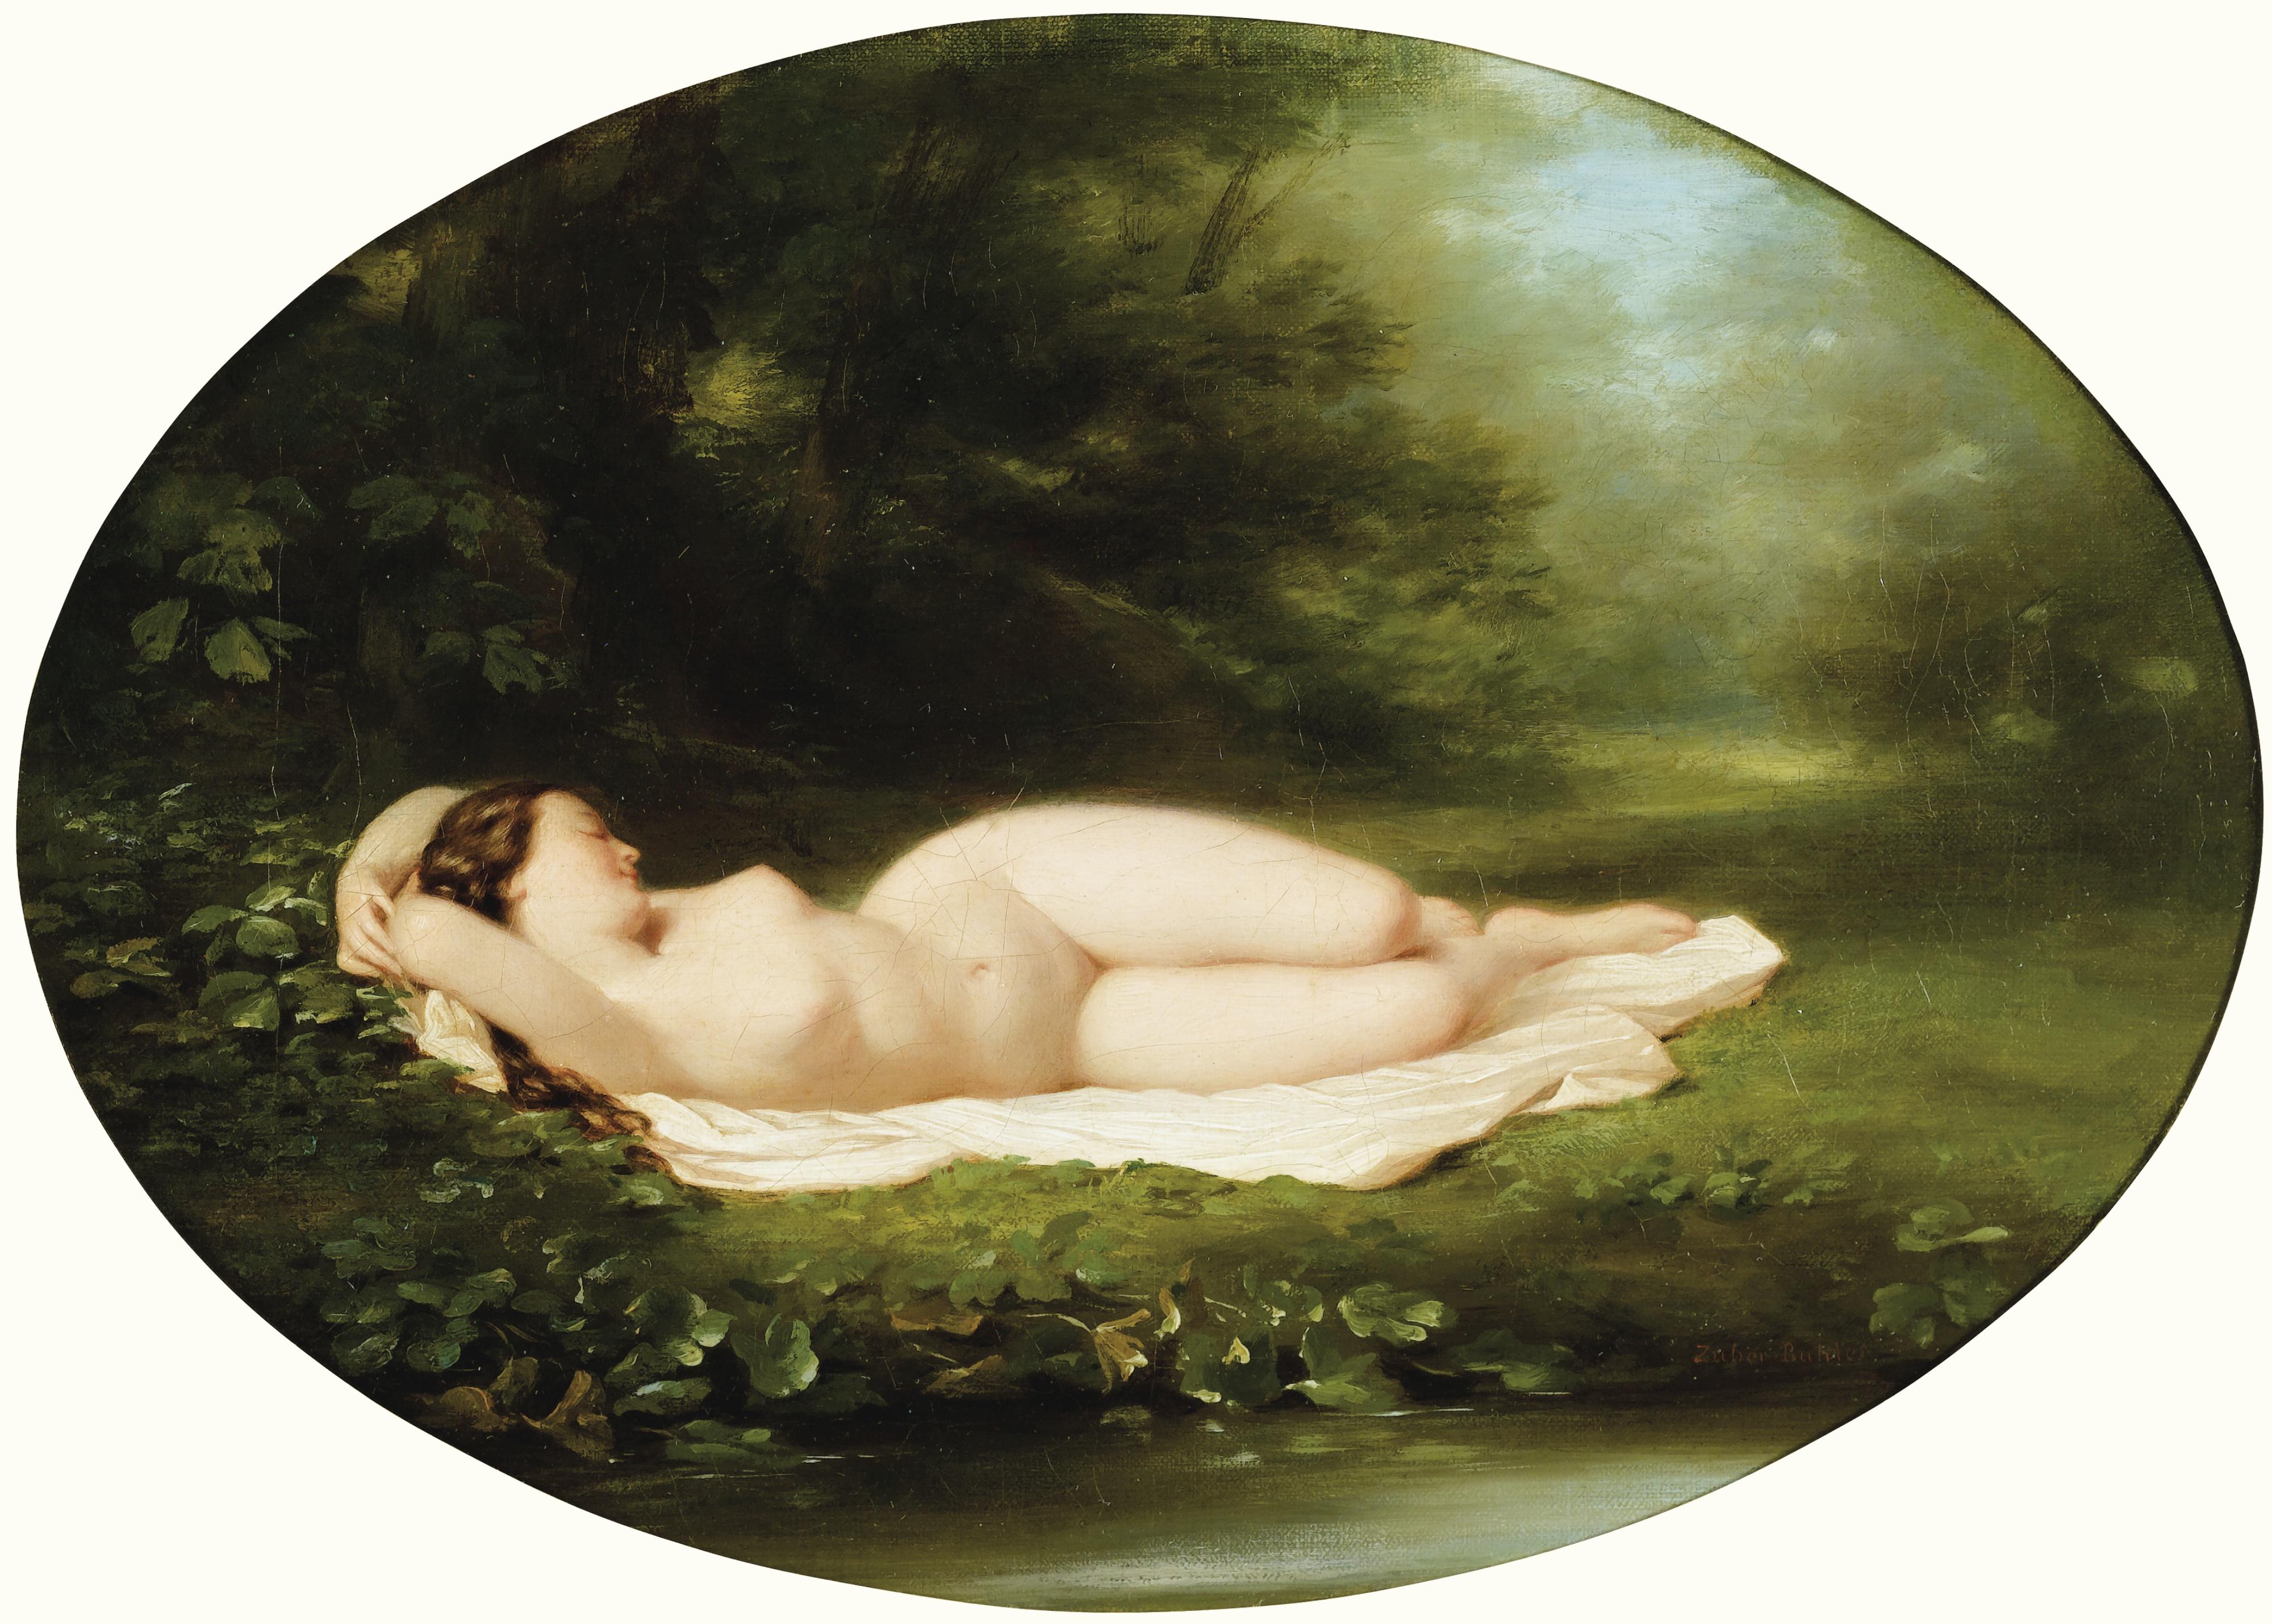 Fritz Zuber-Buhler, 1822-1896. Спящая купальщица. 17 х 23 см. Частная коллекция